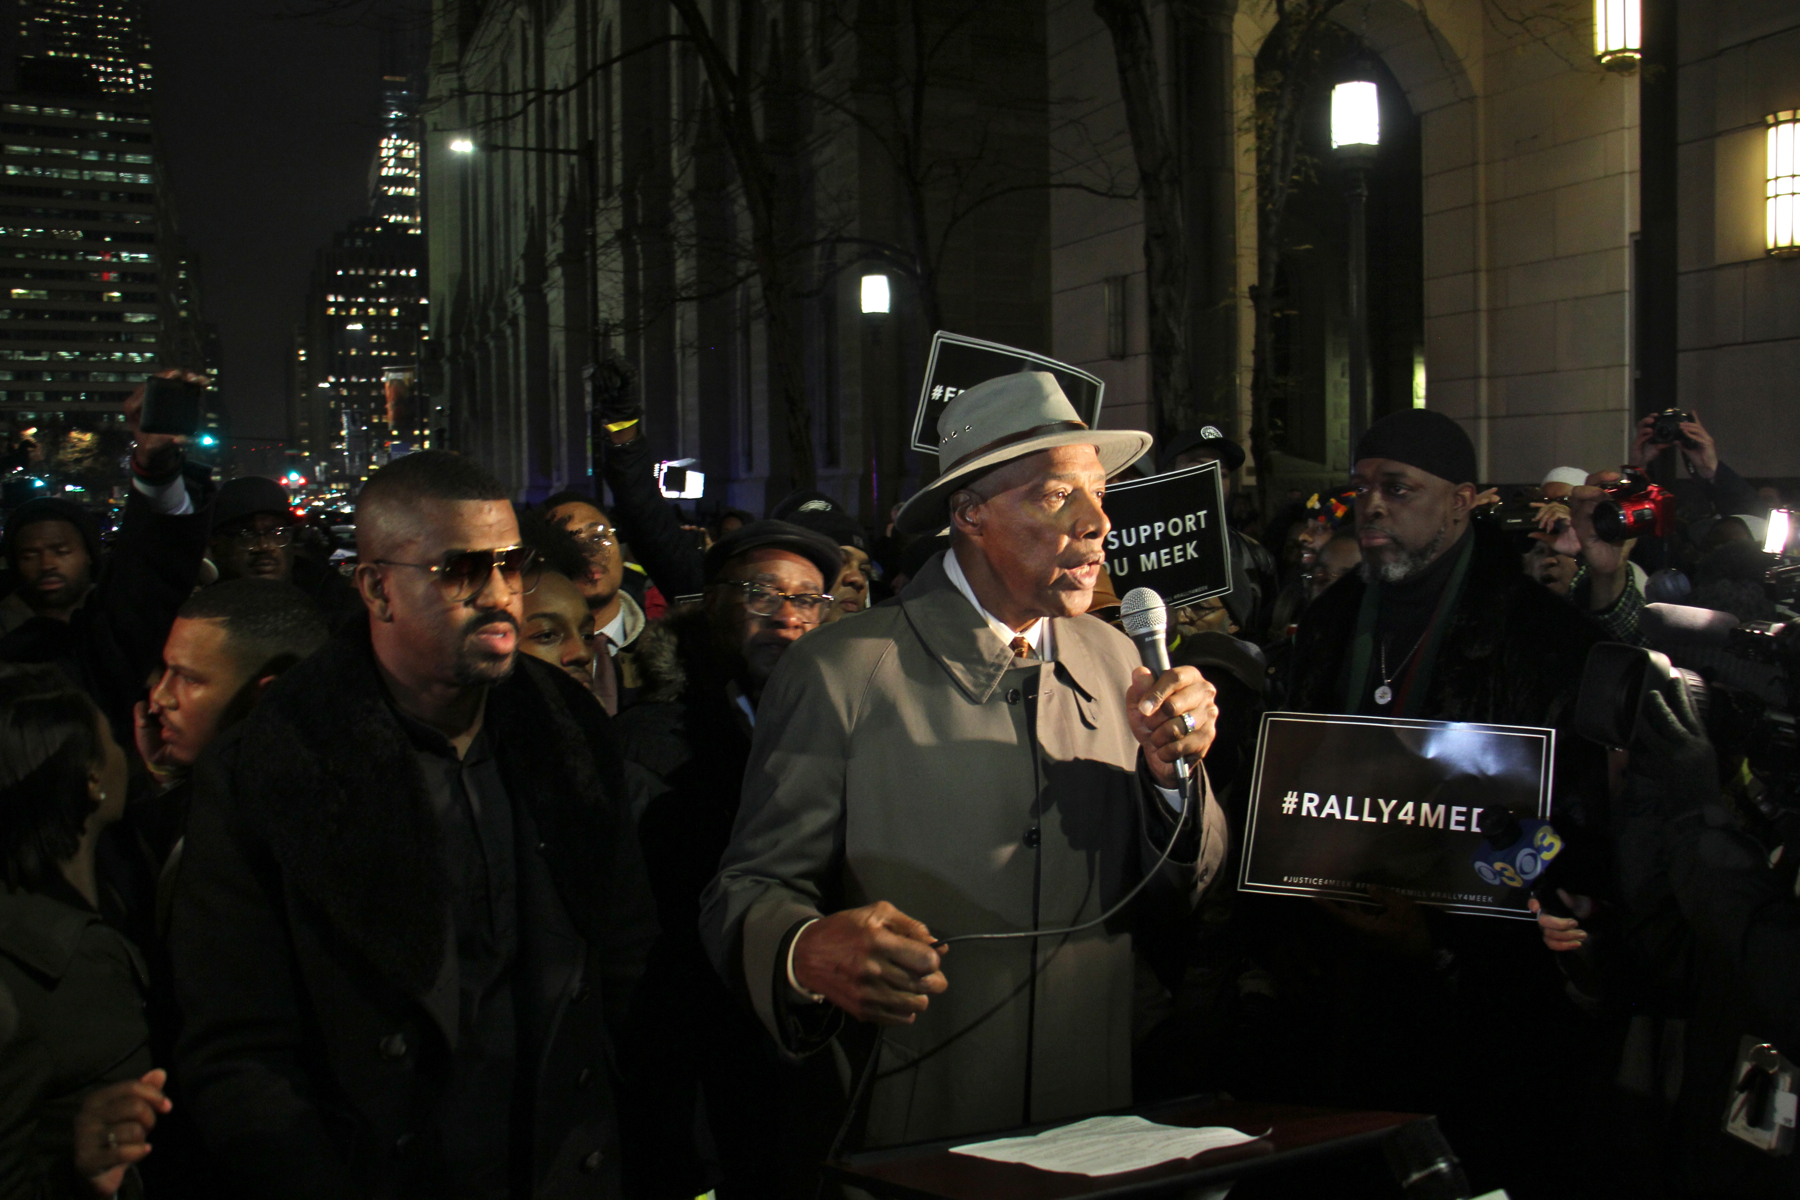 2017-11-13-e-lee-julius-erving-philadelphia-center-for-criminal-justice-rally-for-meek-mill.jpg